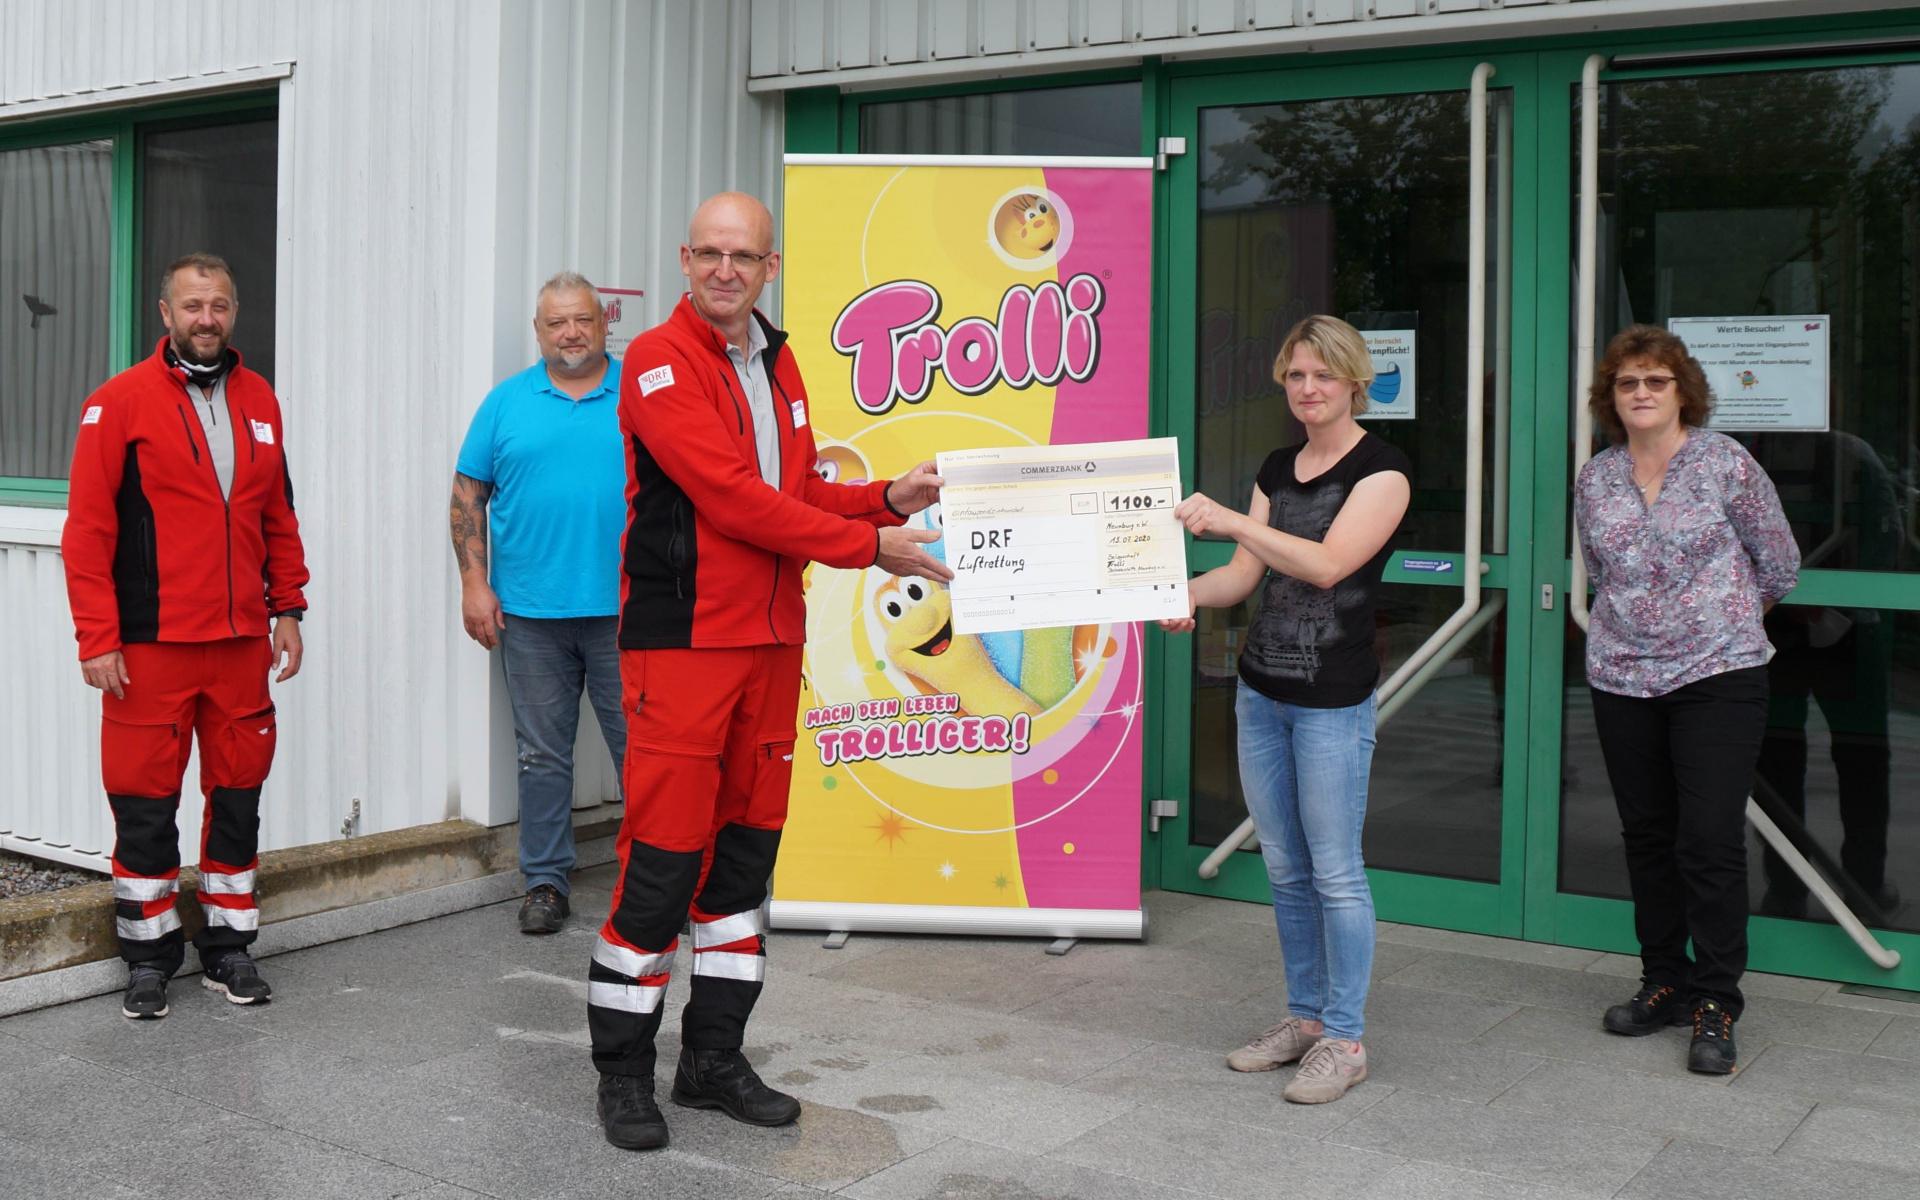 Stationsleiter Peter Flor nimmt vor dem Werkstor der Firma Trolli die Spende entgegen (Quelle Grit Popelka)